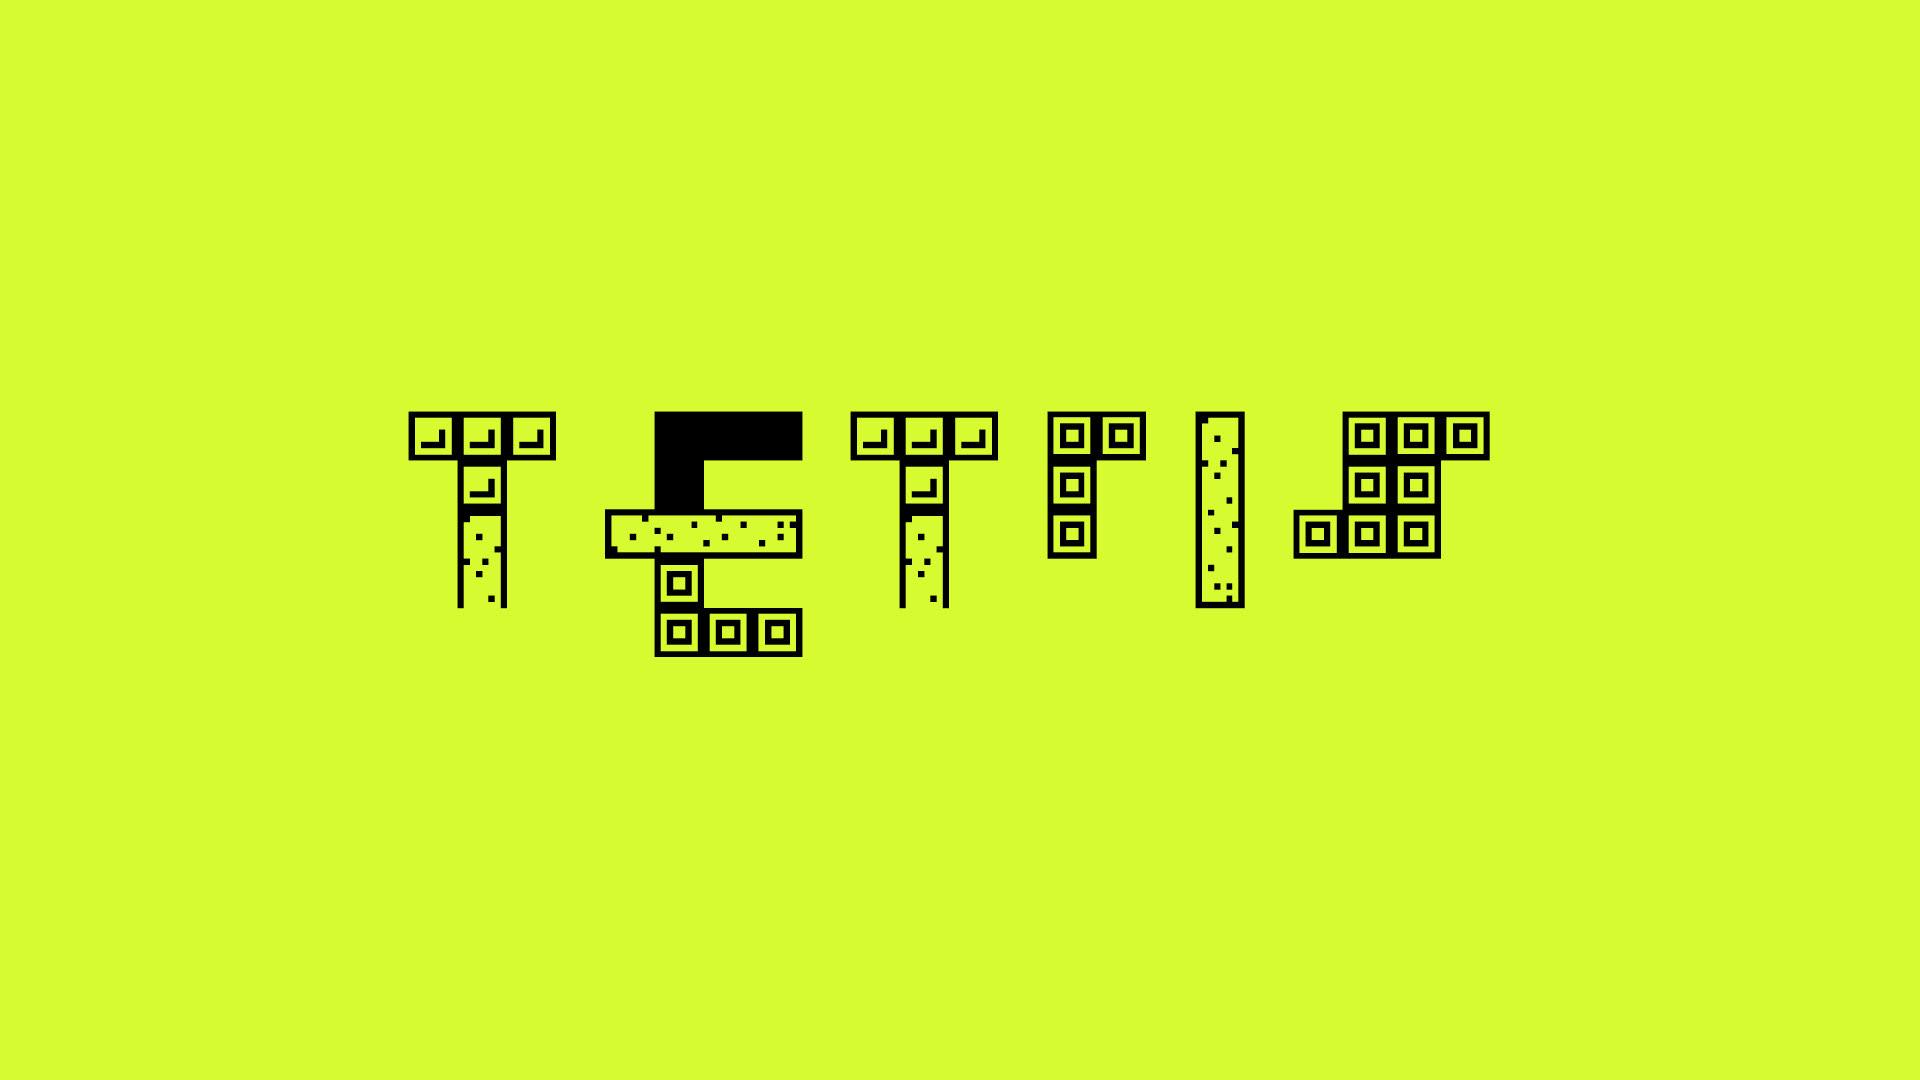 Ian Perkins Graphic Art - Graphics: Tetris Typeface Design